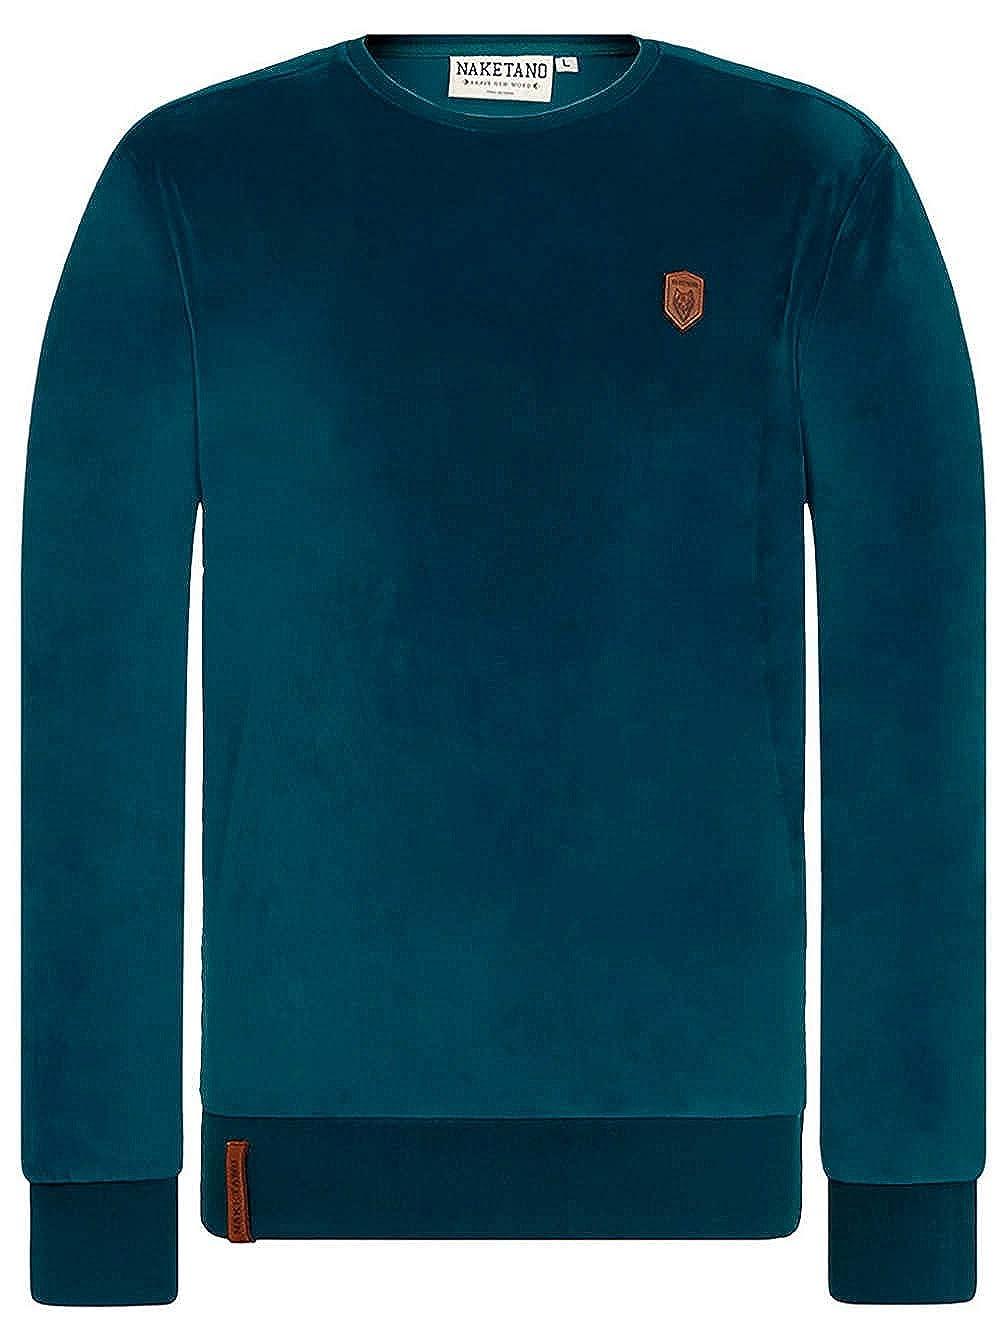 Naketano Herren Sweater Asgardian Mack Sweater